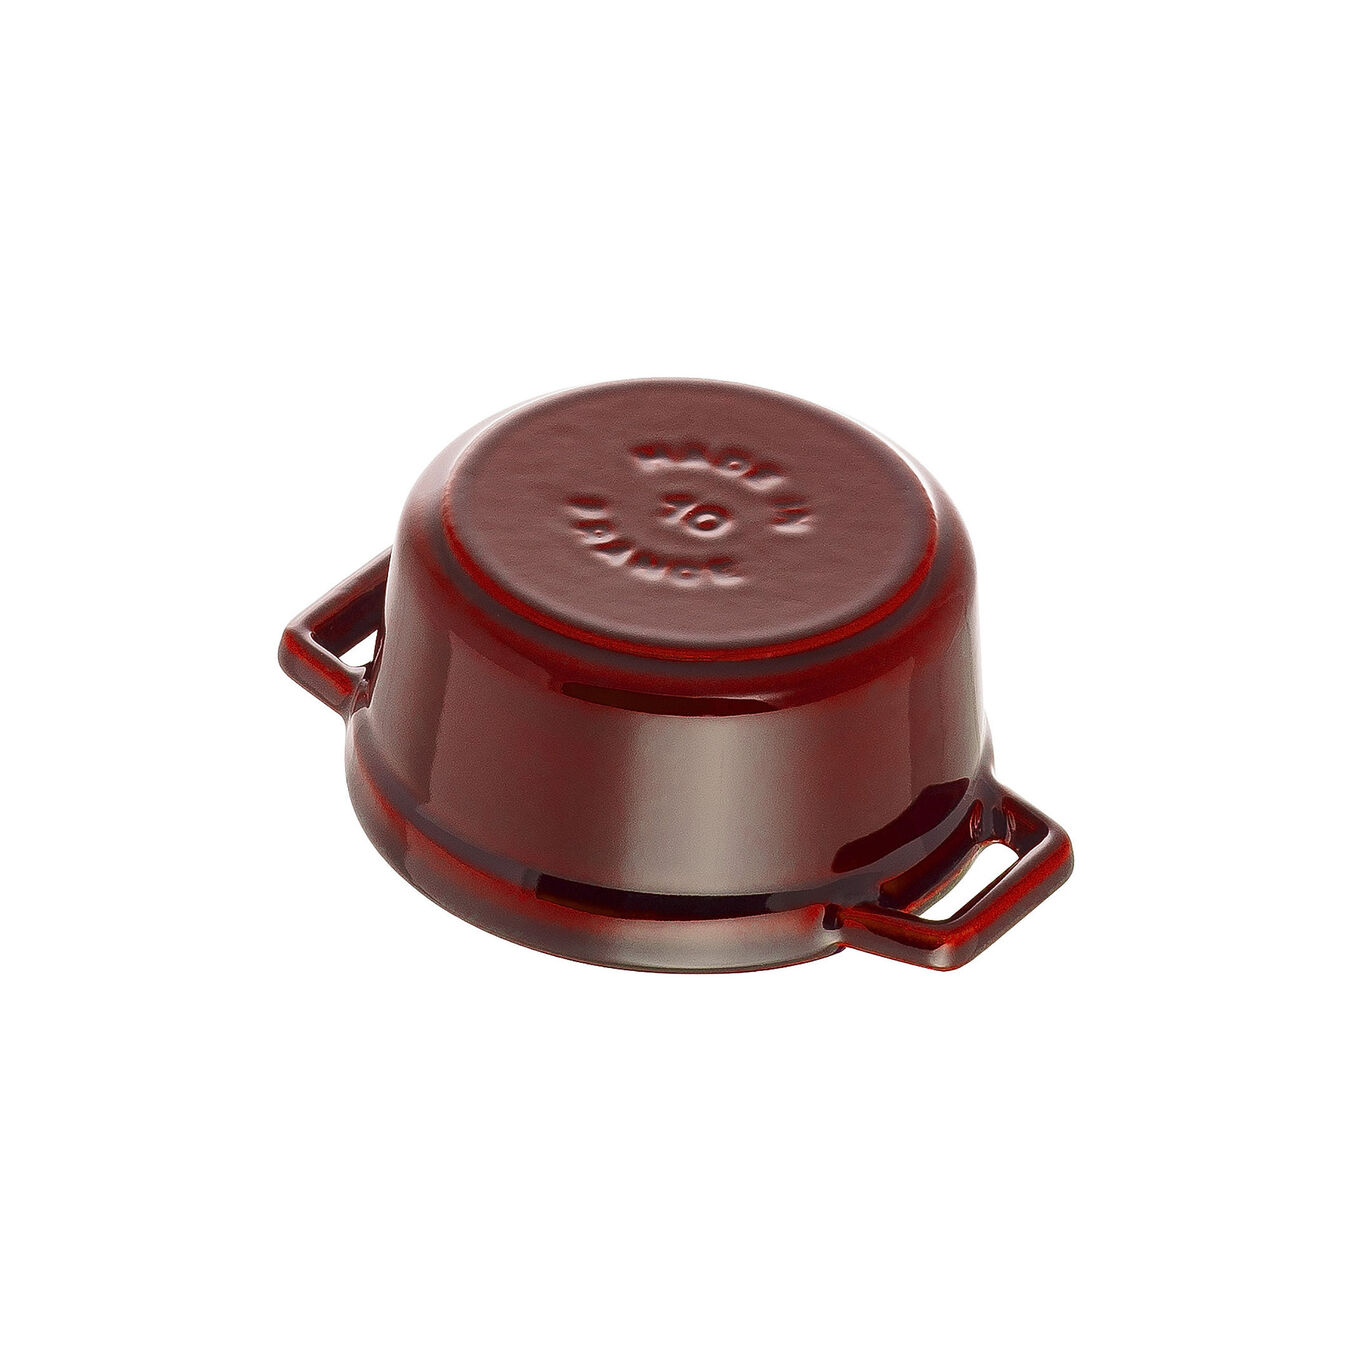 250 ml Cast iron round Mini Cocotte, grenadine-red,,large 4